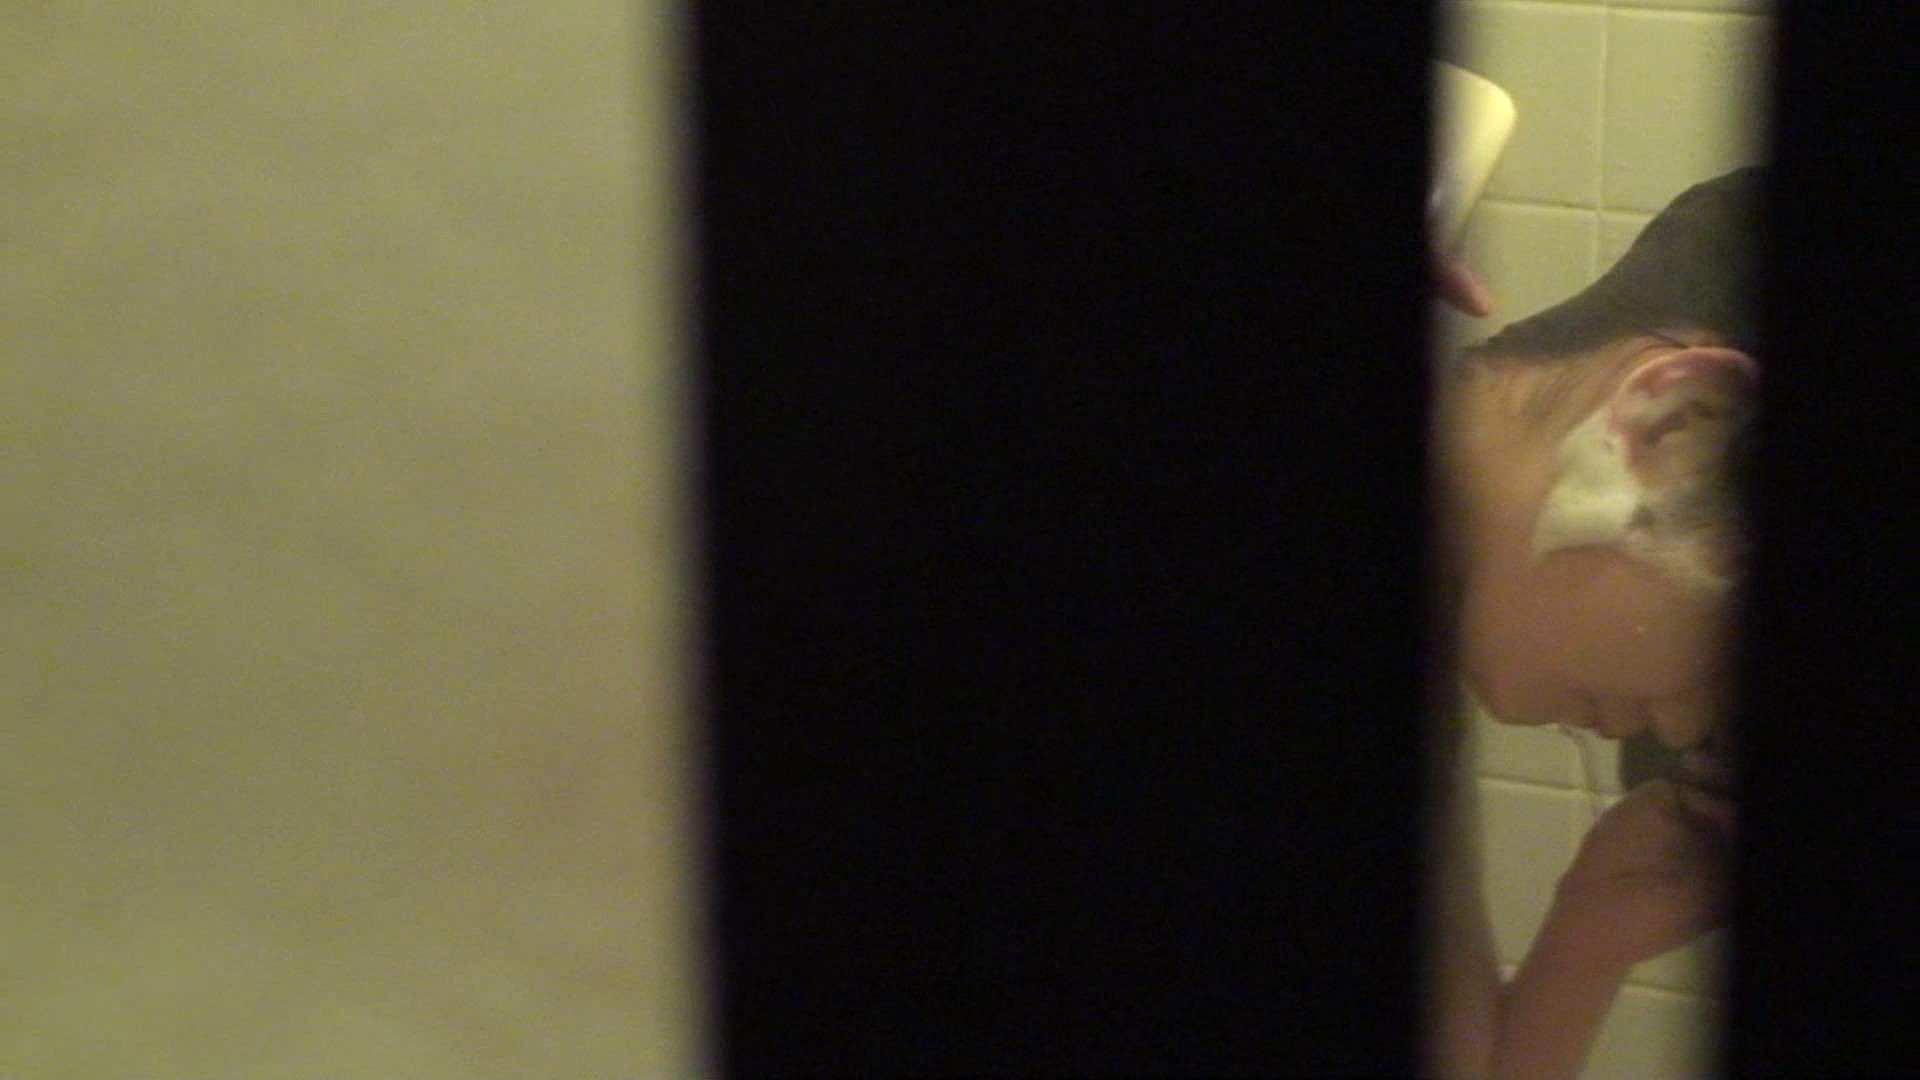 vol.02超可愛すぎる彼女の裸体をハイビジョンで!至近距離での眺め最高! 覗き ワレメ無修正動画無料 78pic 23